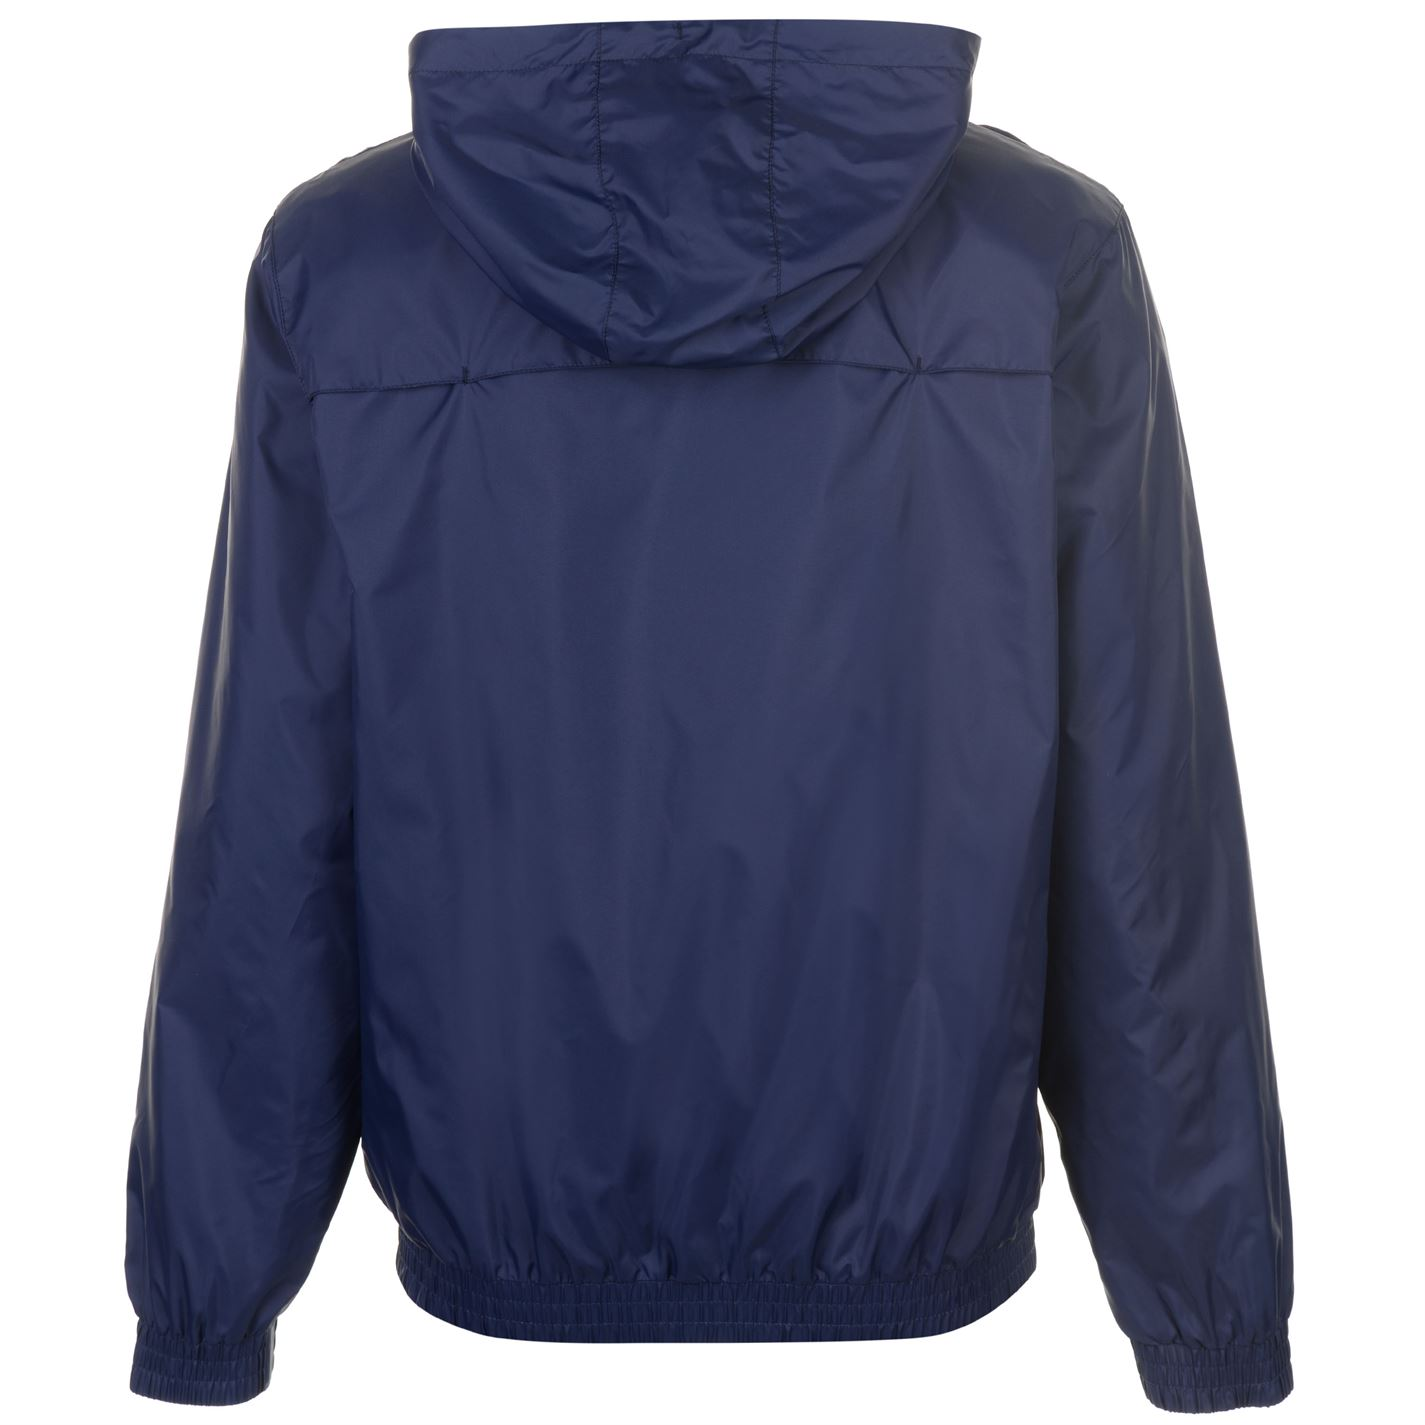 b9af26e4f344 Everlast Mens Geo Rain Jacket Coat Top Long Sleeve Breathable ...